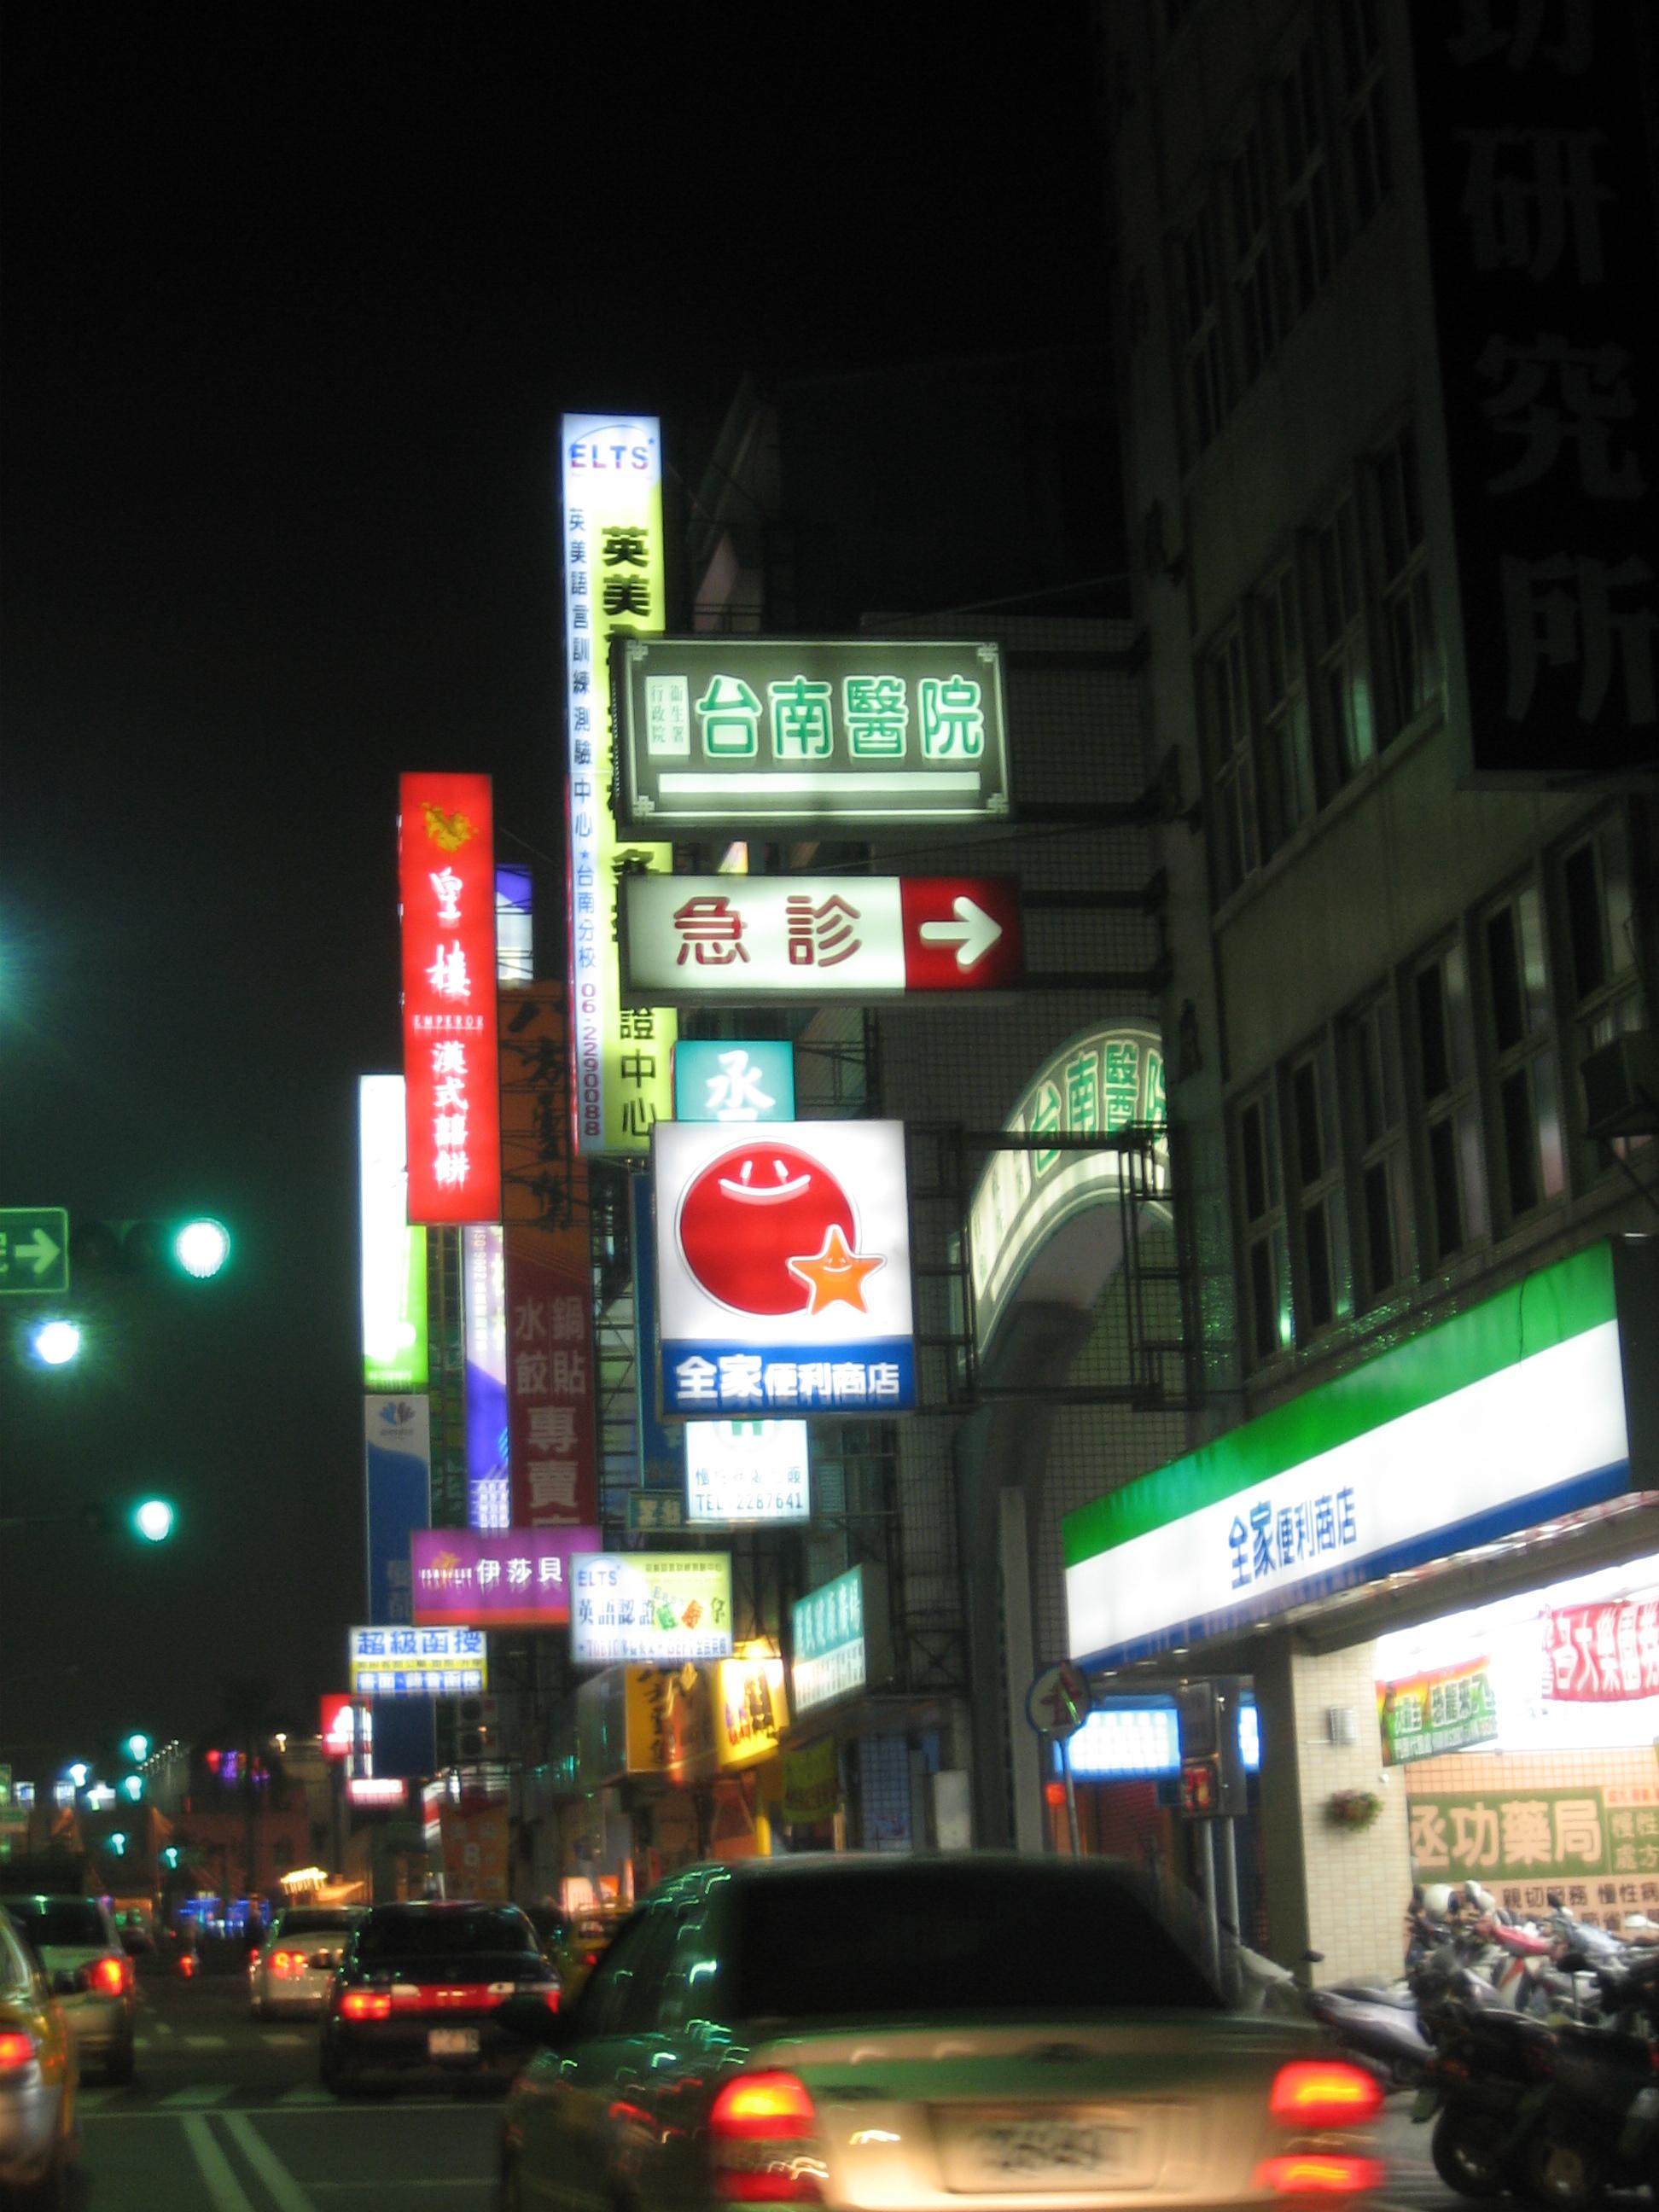 In Taichung